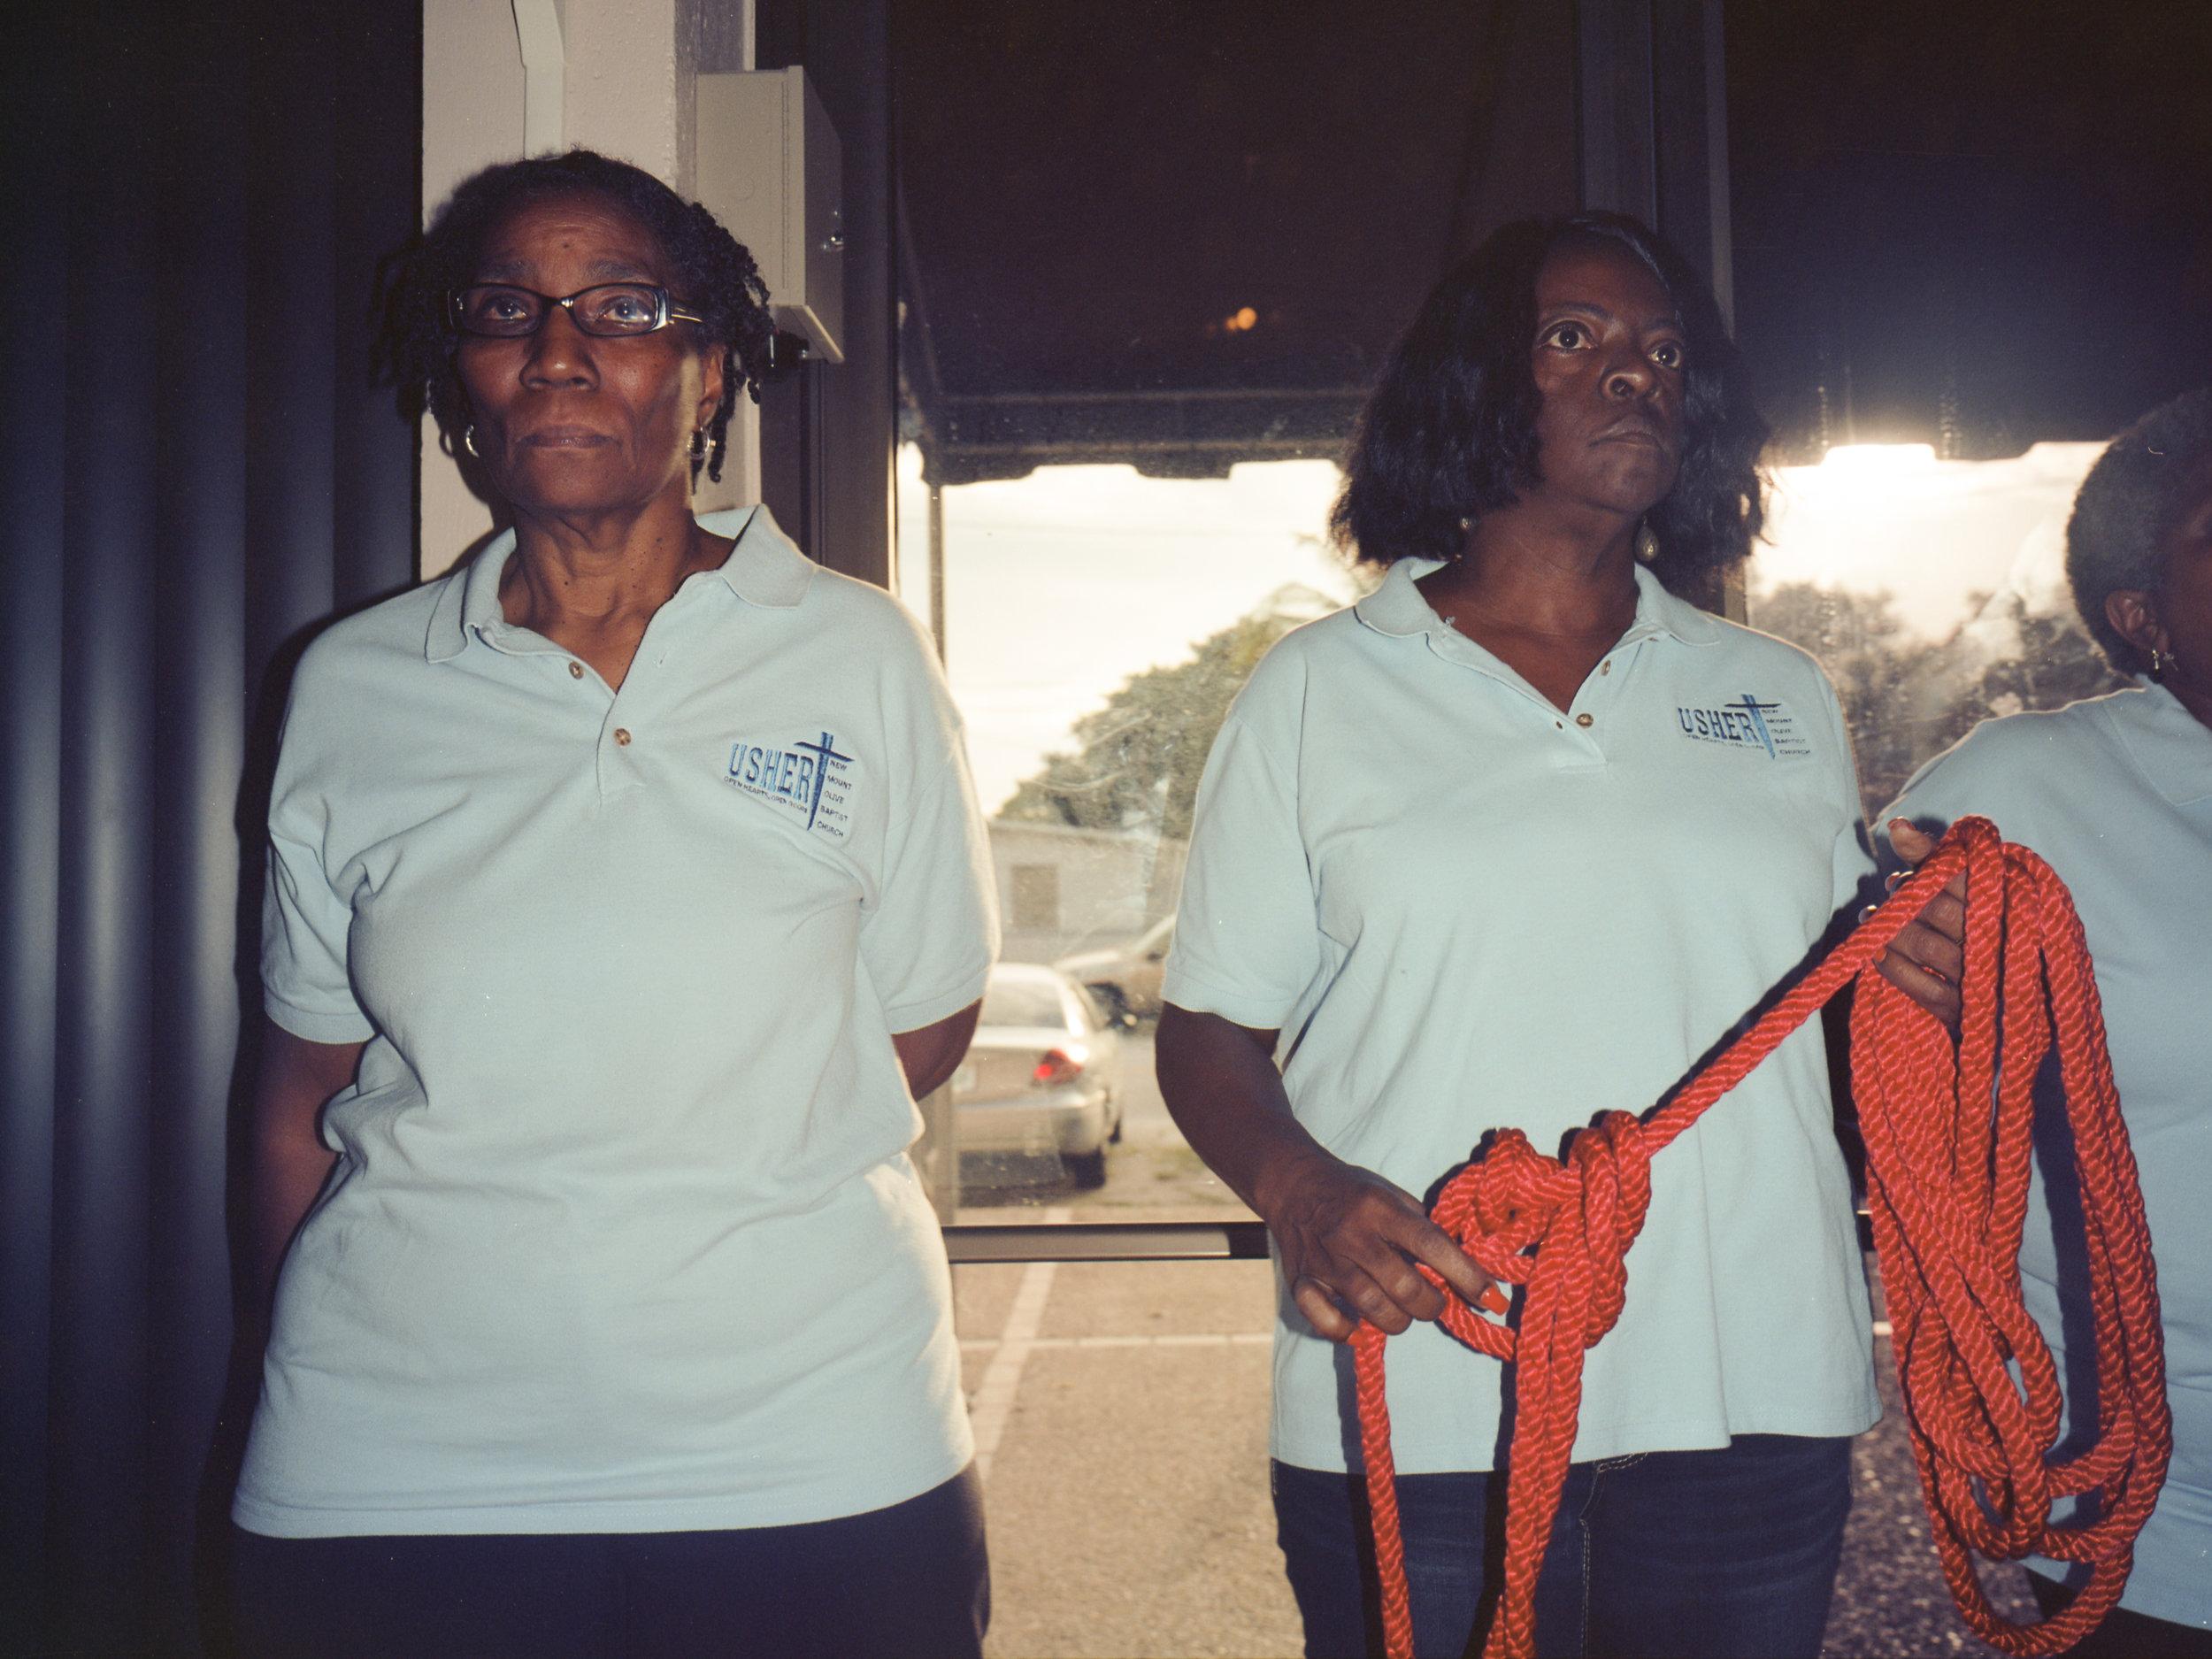 West Palm Beach, FL - 2013